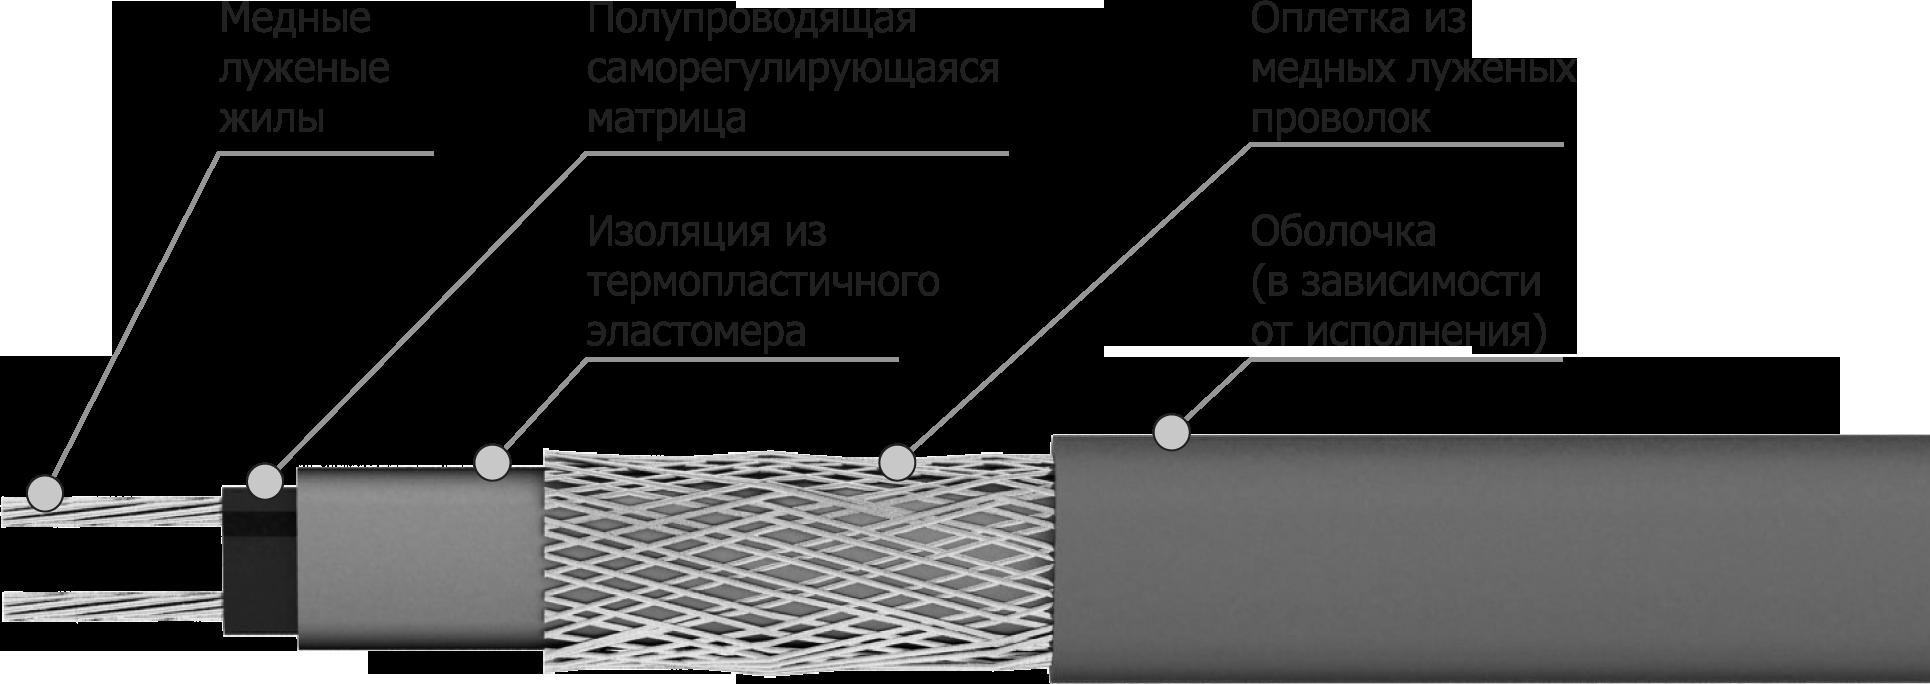 саморегулирующийся кабель VR